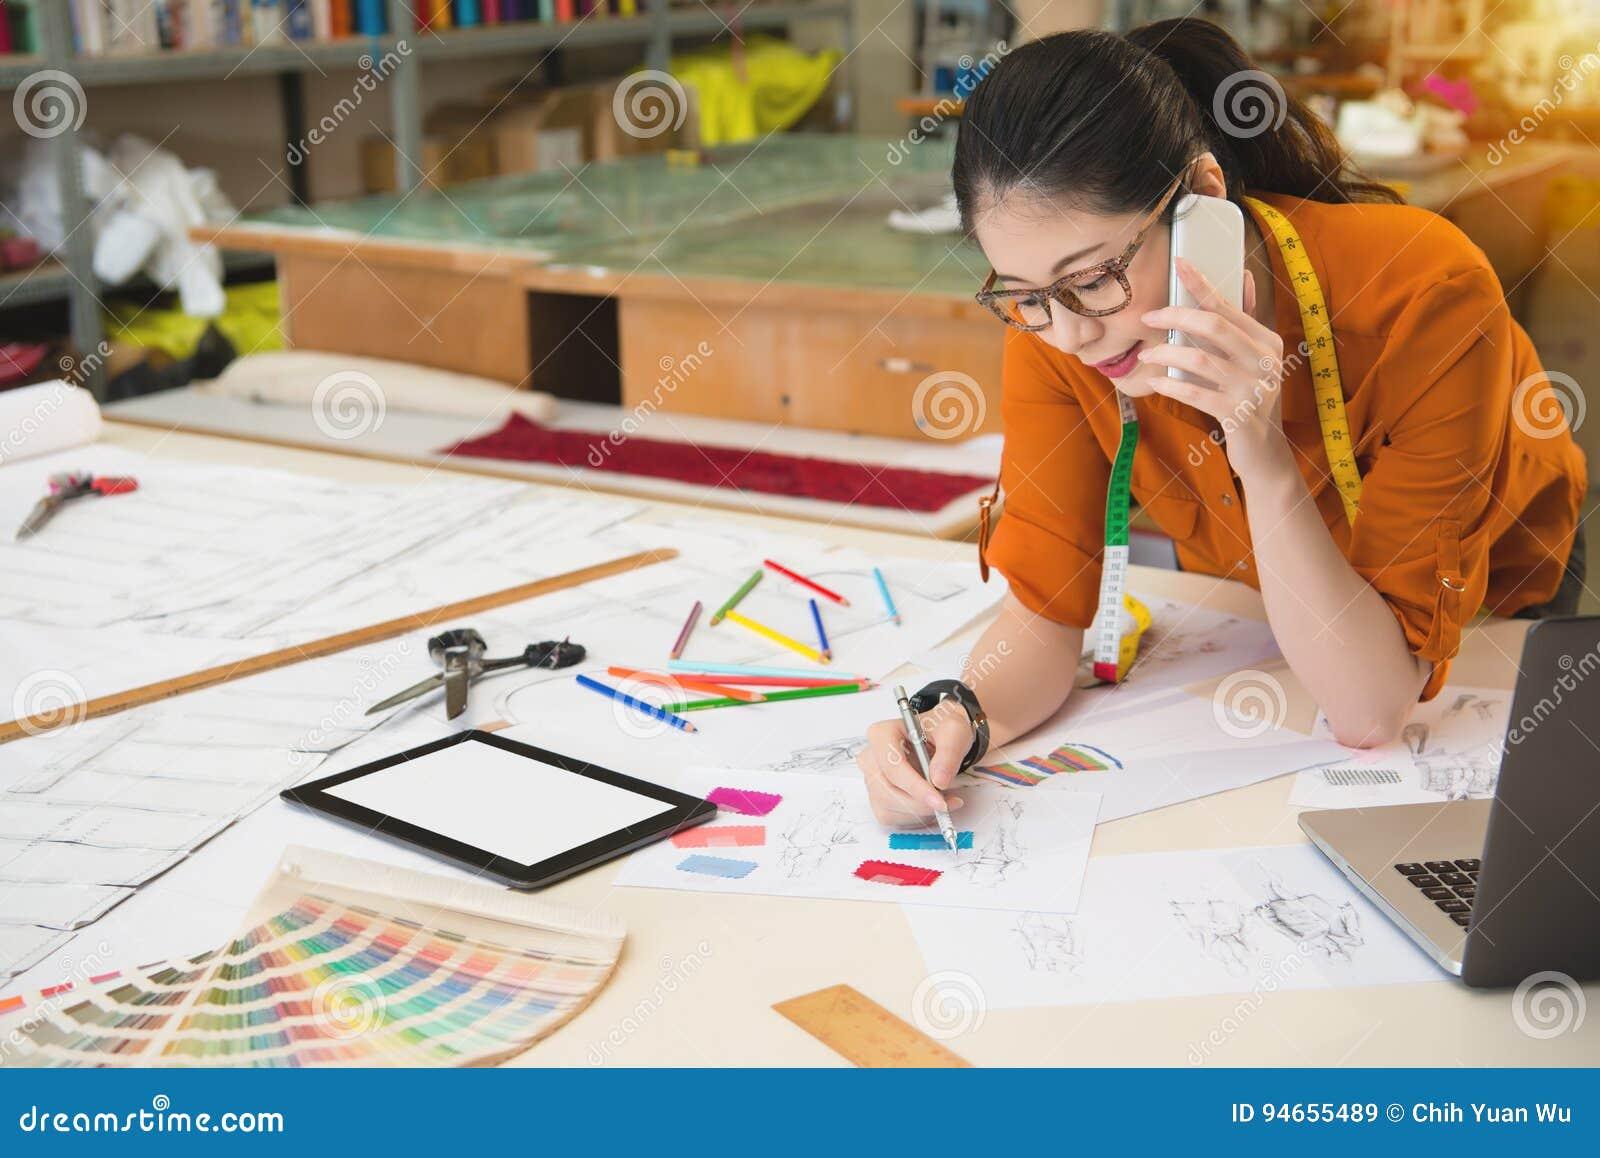 writer to write an essay sat